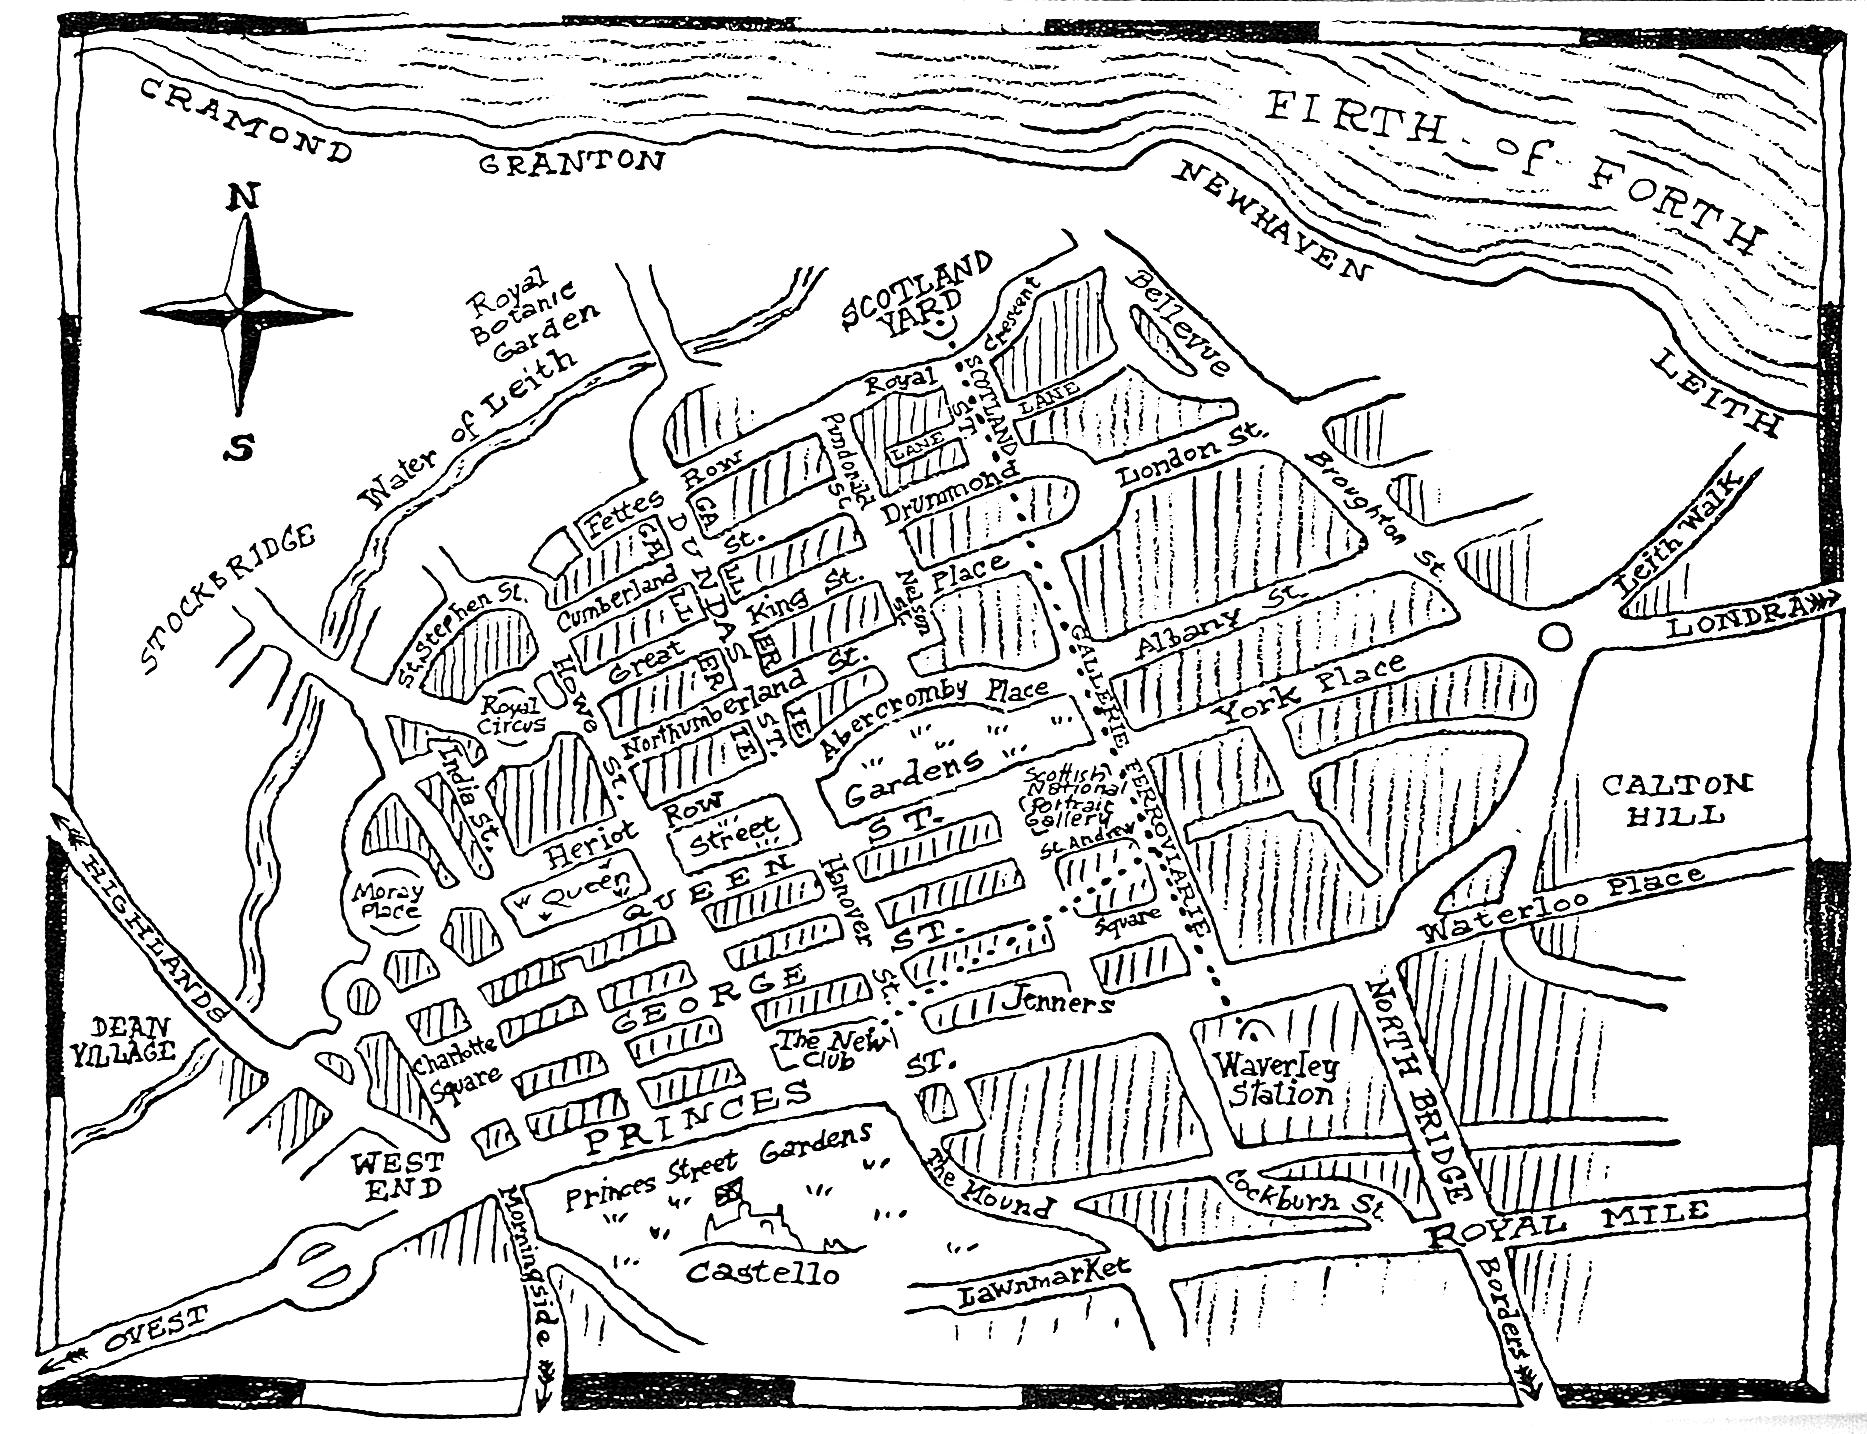 44 Scotland Street - Edinburgh Map